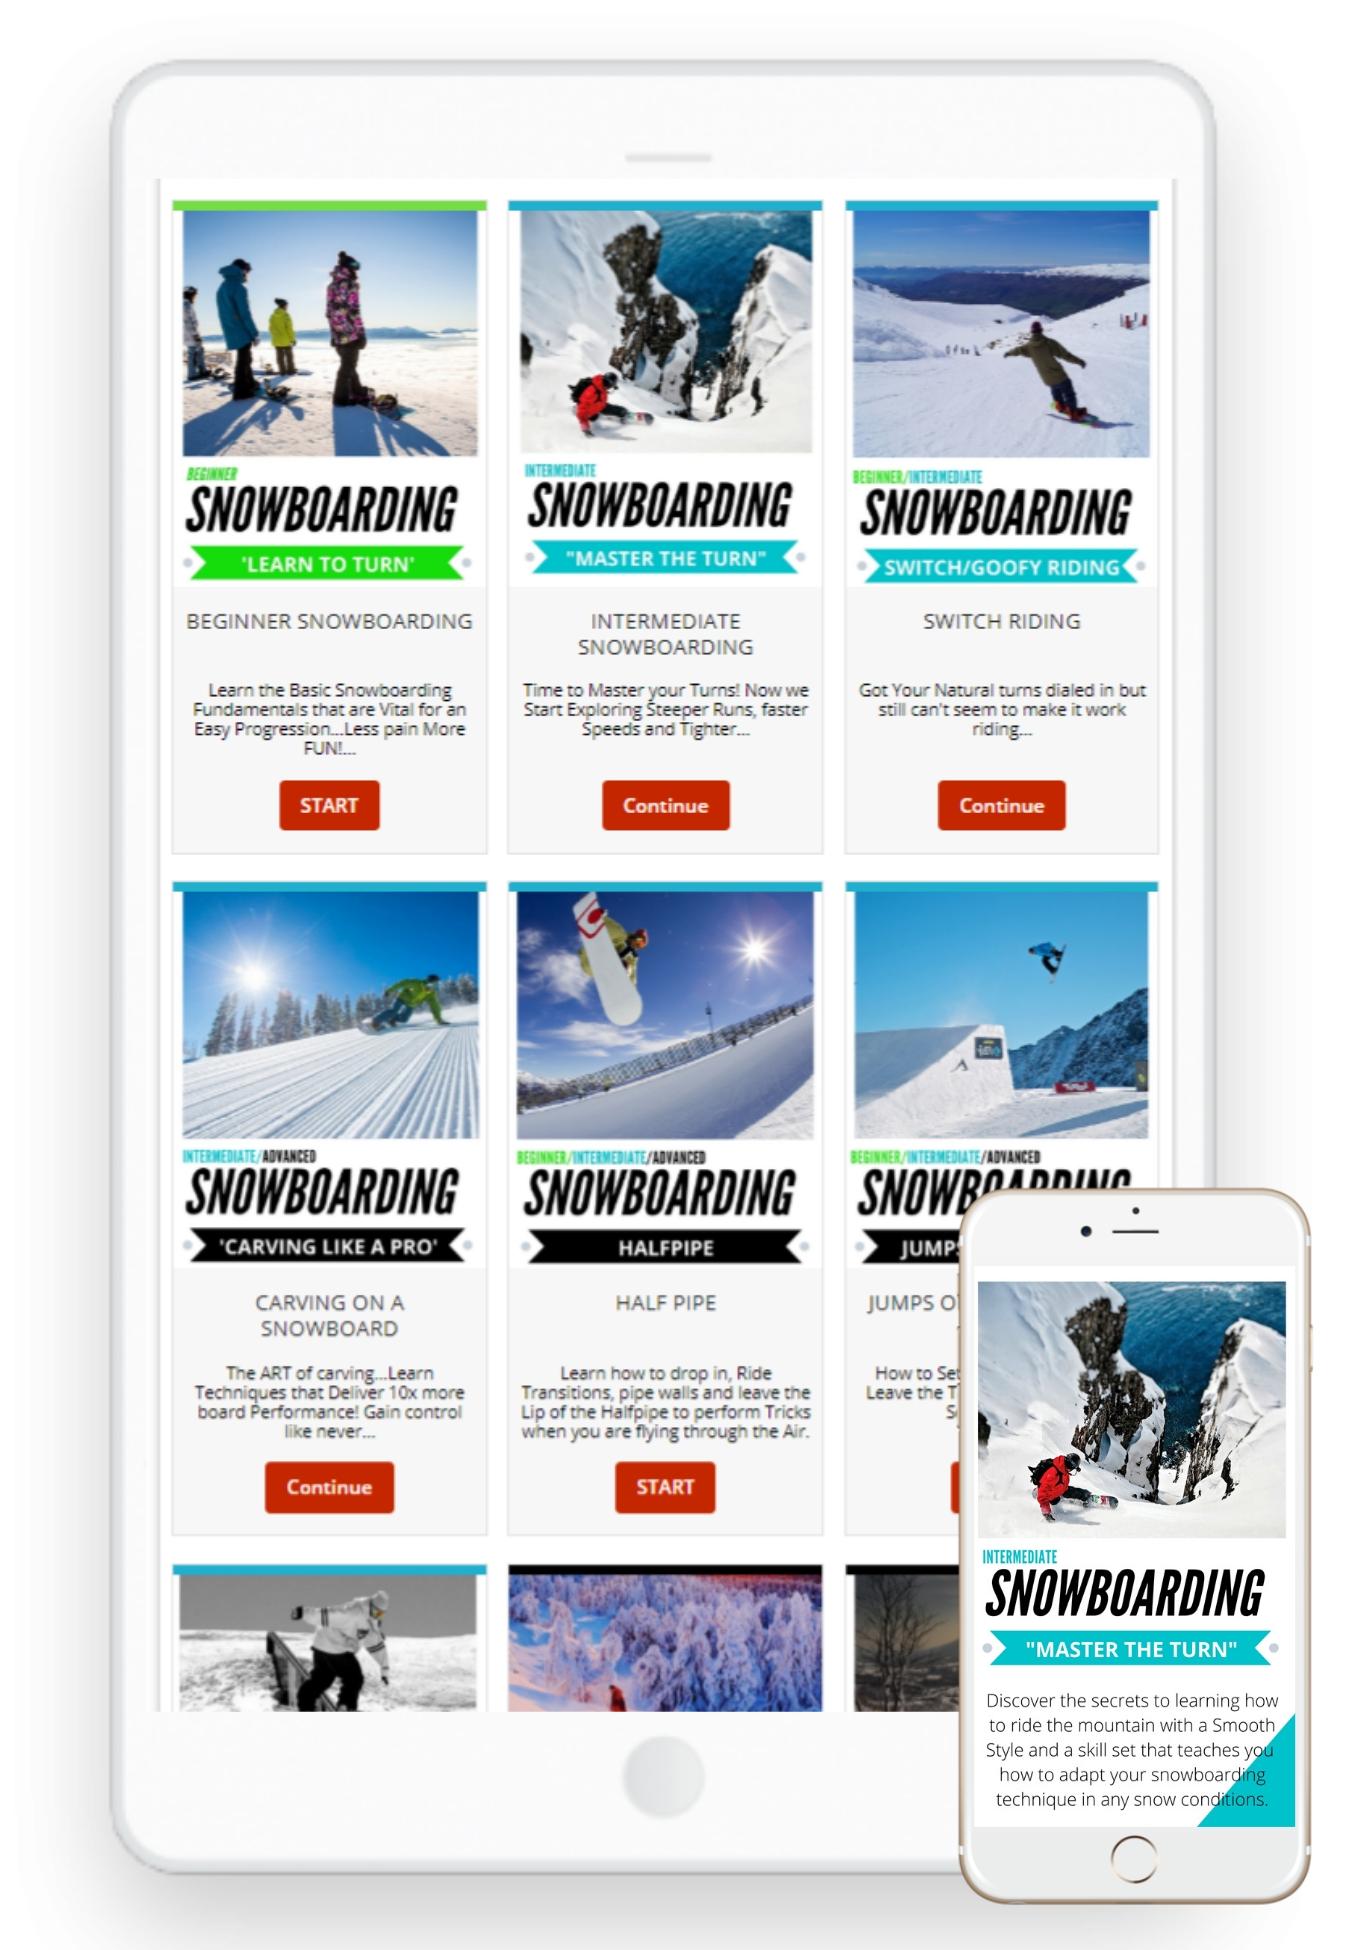 snowboarding-tutorials-